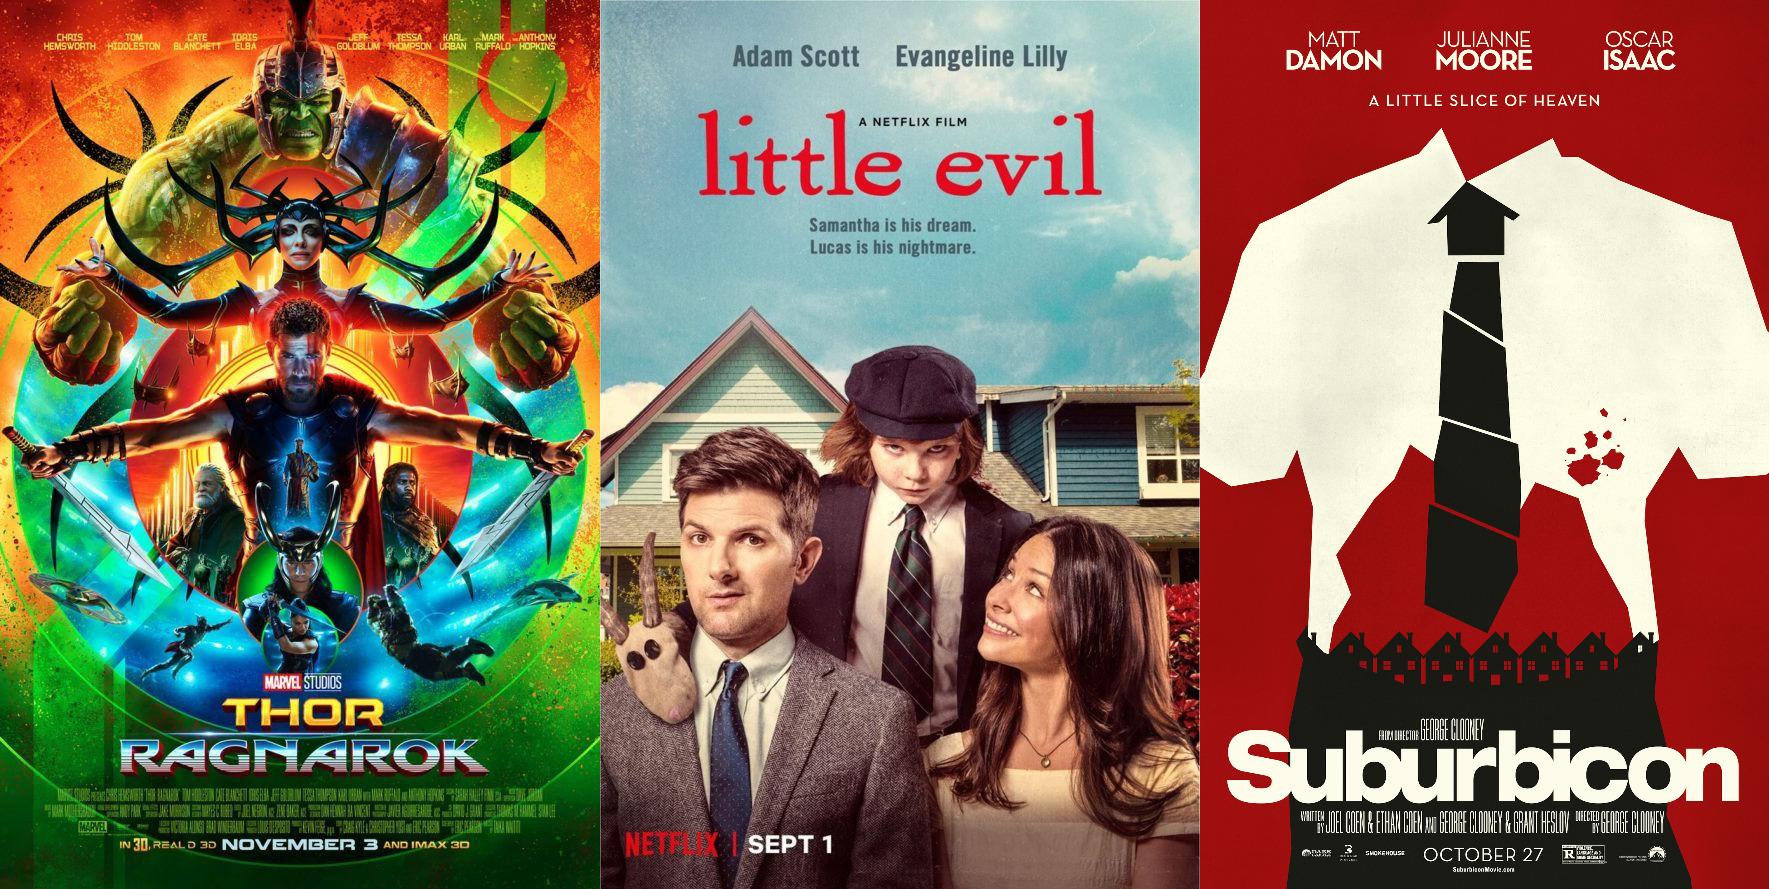 Trailer-Watchin' Wednesday: Thor 3, Suburbicon, Little Evil